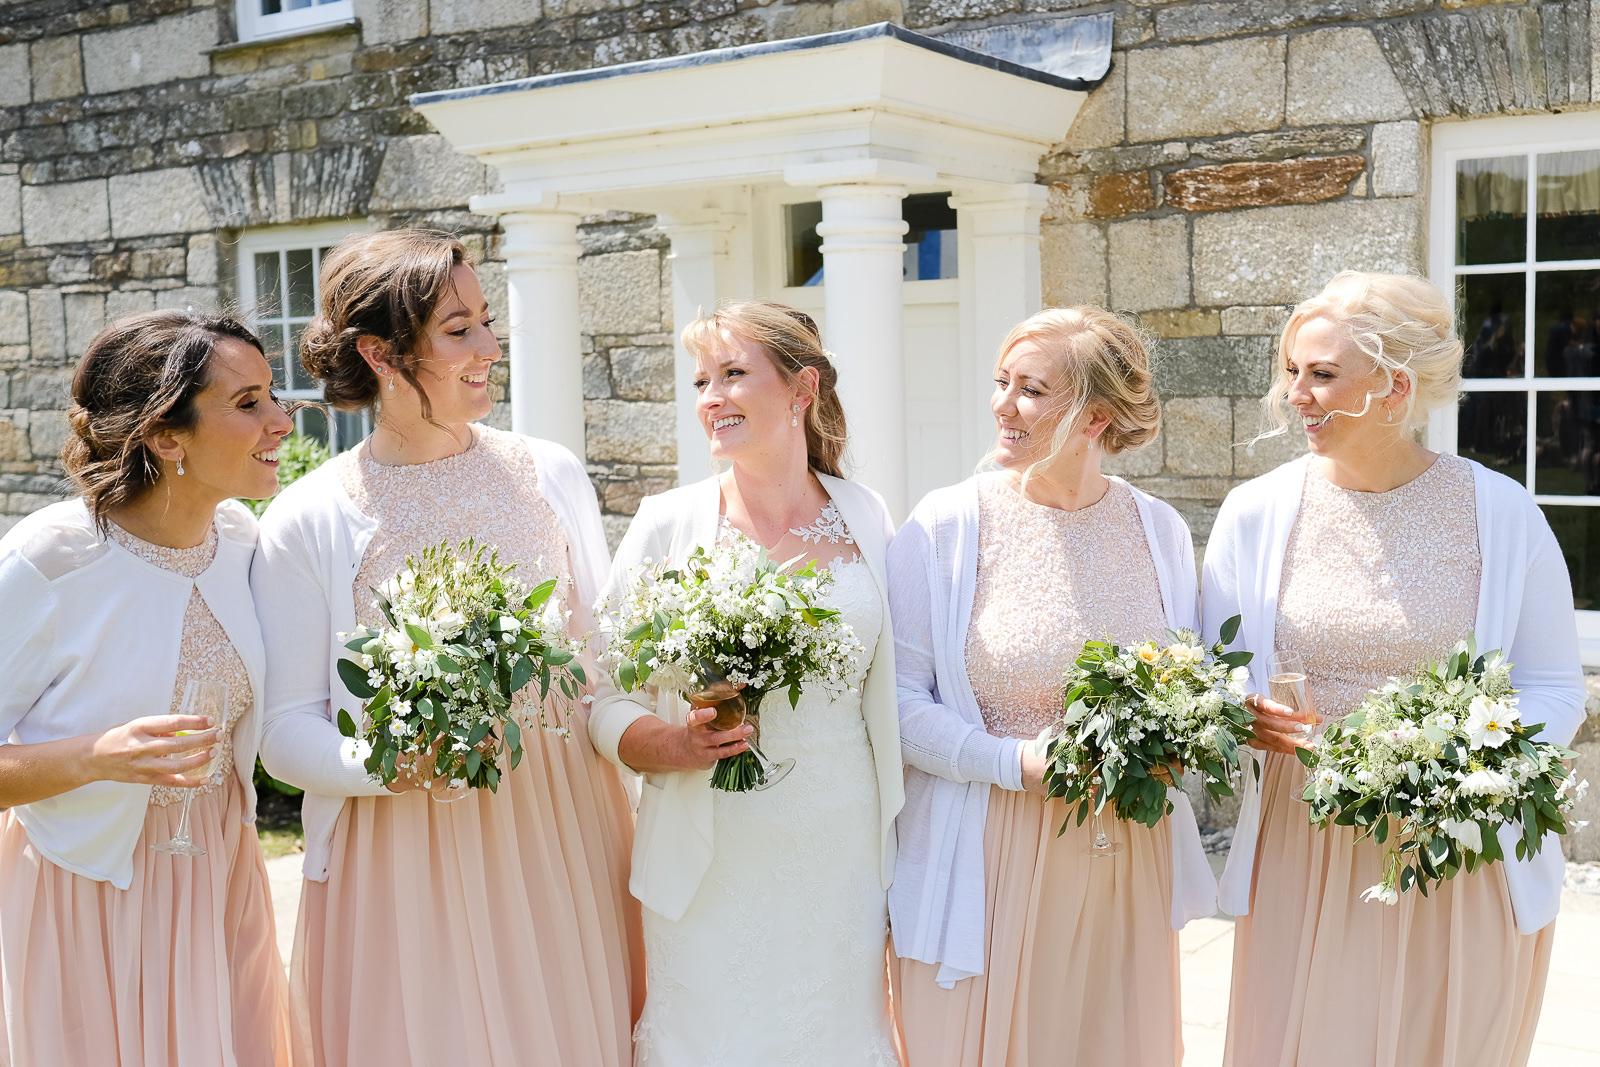 Roscarrock Farm wedding in Cornwall 047.jpg